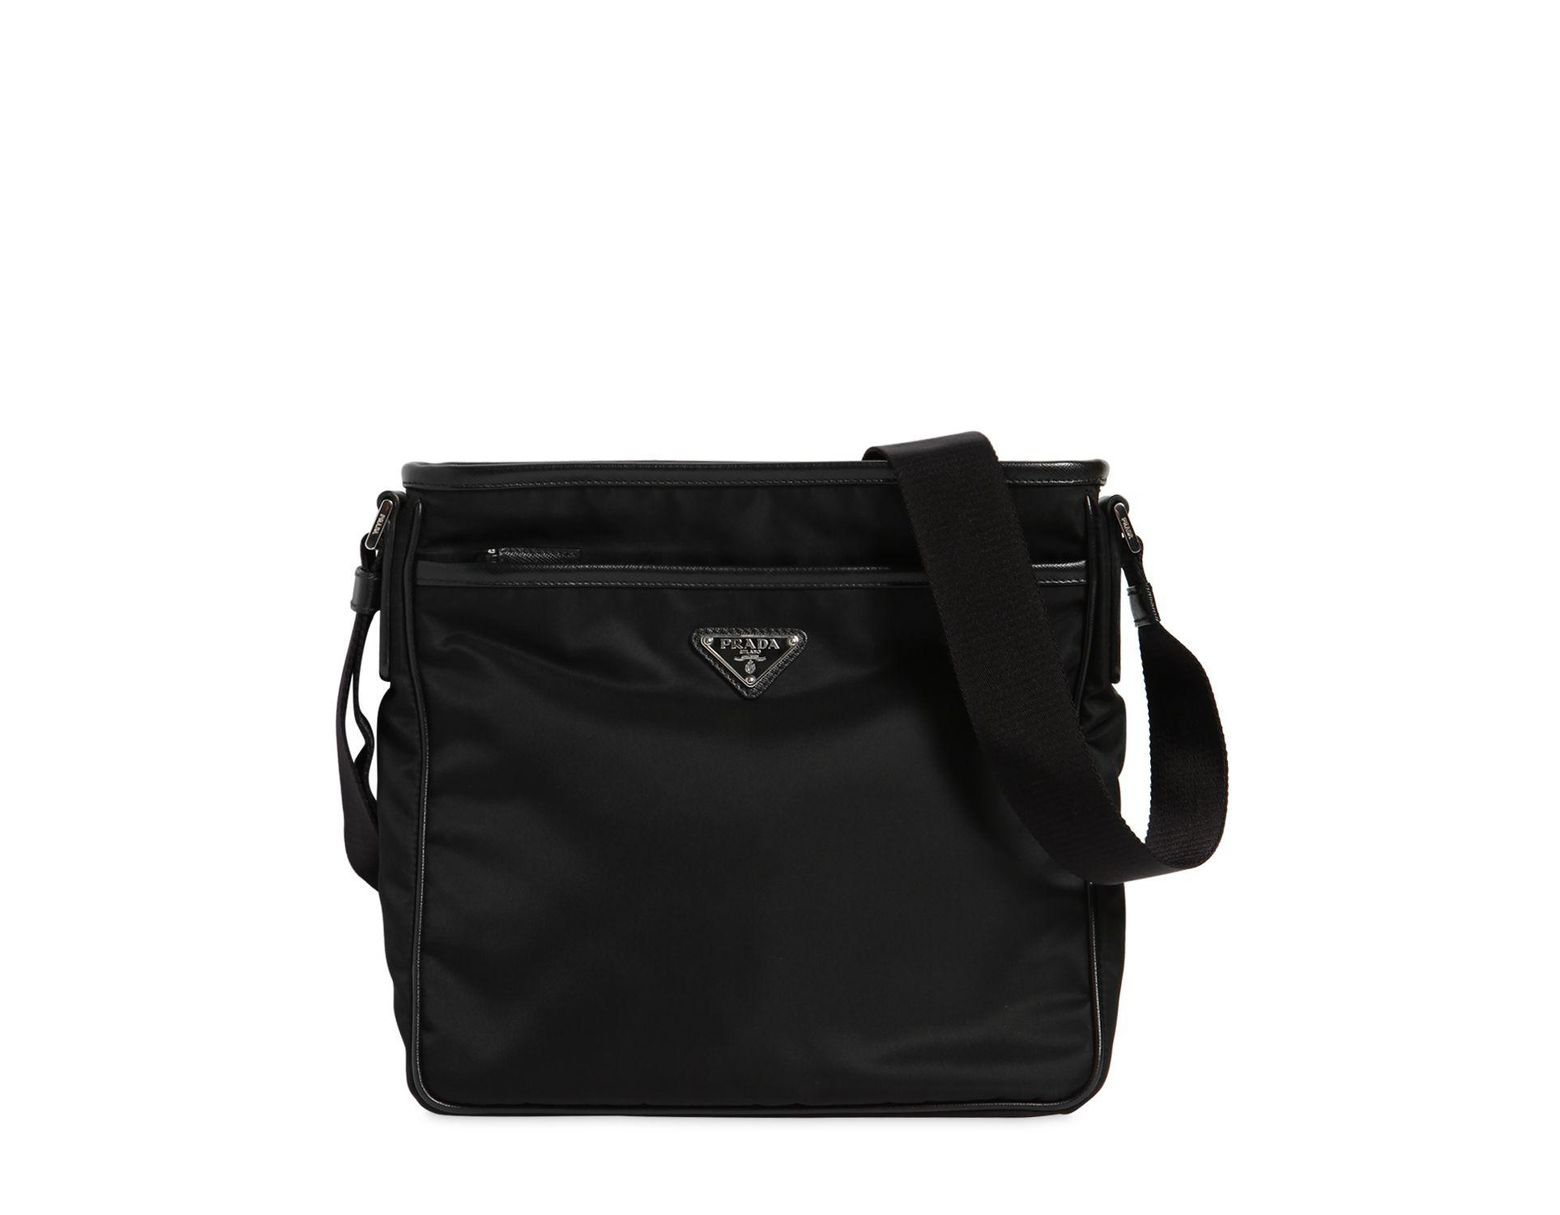 6b83660e82ba Prada Nylon Crossbody Bag W/ Leather Trim in Black for Men - Lyst